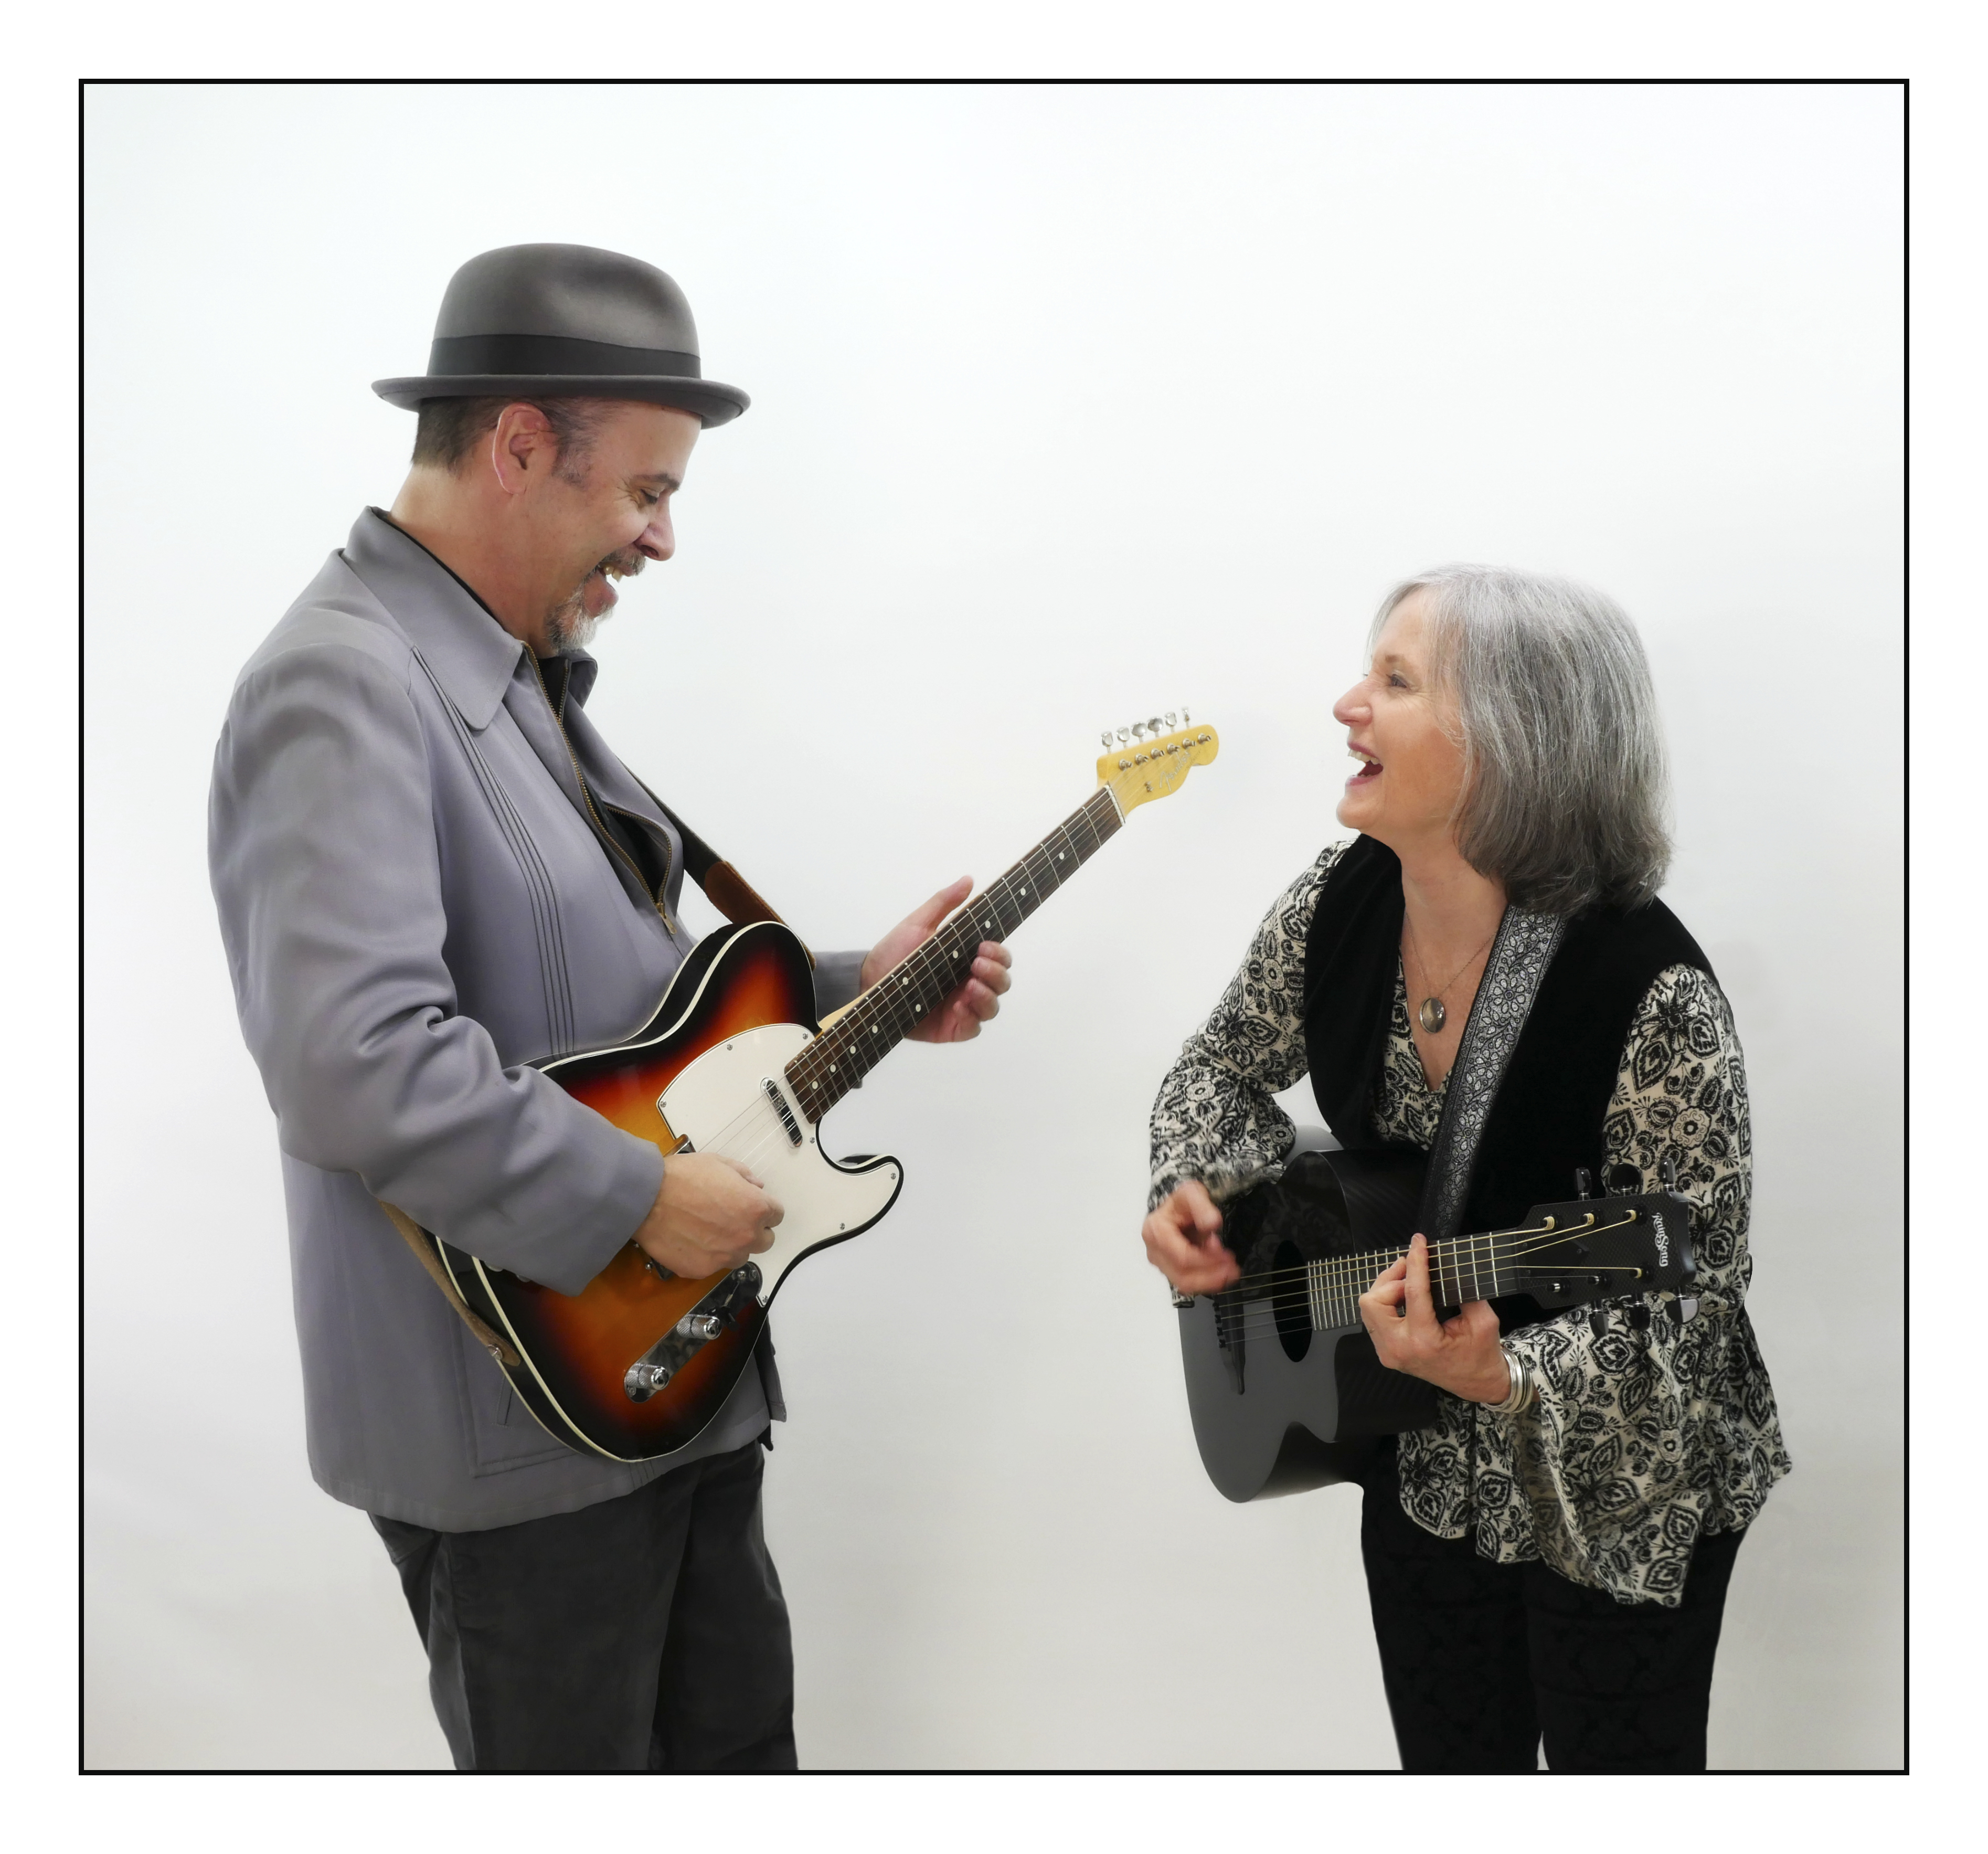 Claudia Russell and Bruce Kaplan, California